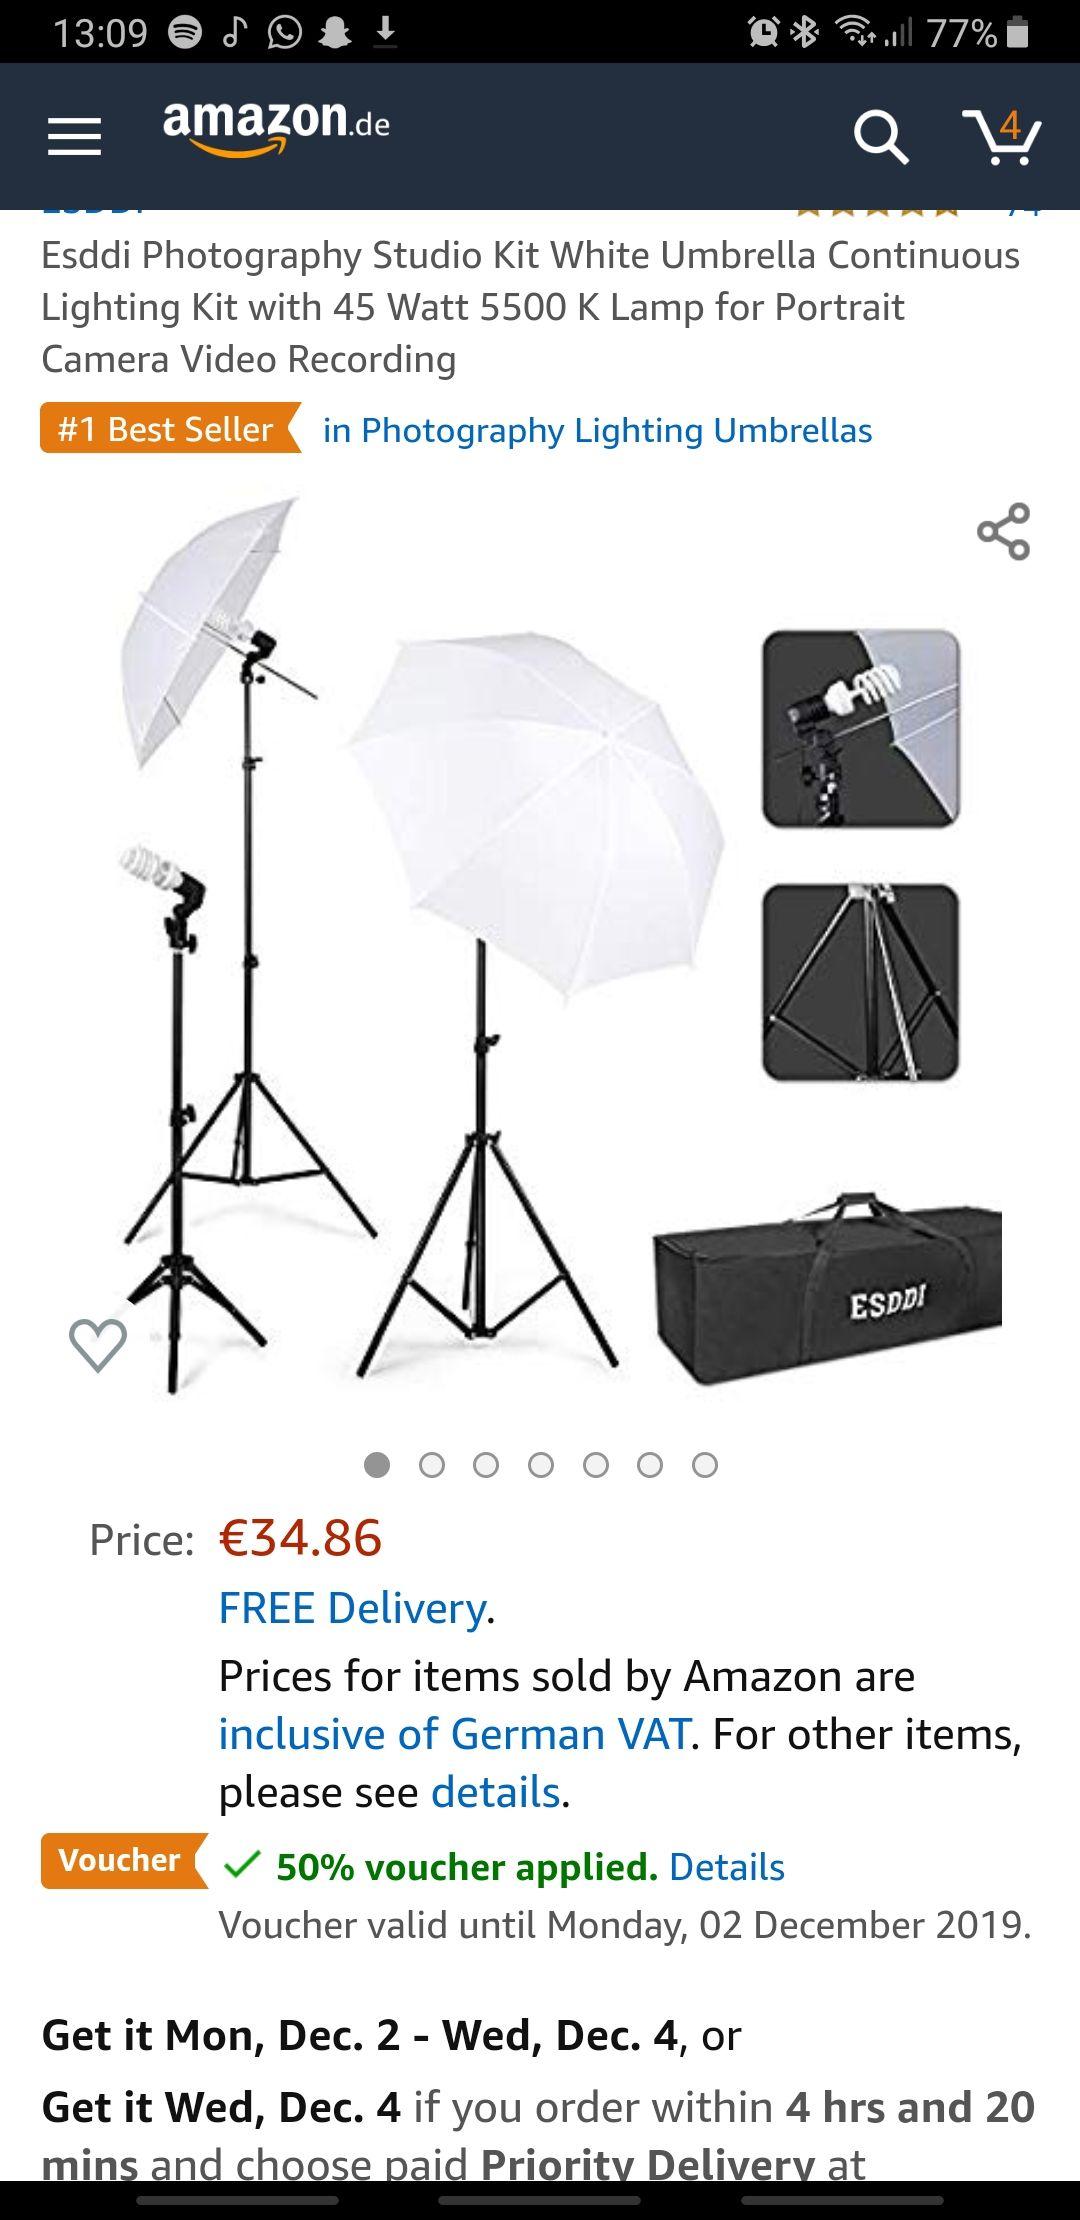 Esddi Photography Studio Kit White Umbrella